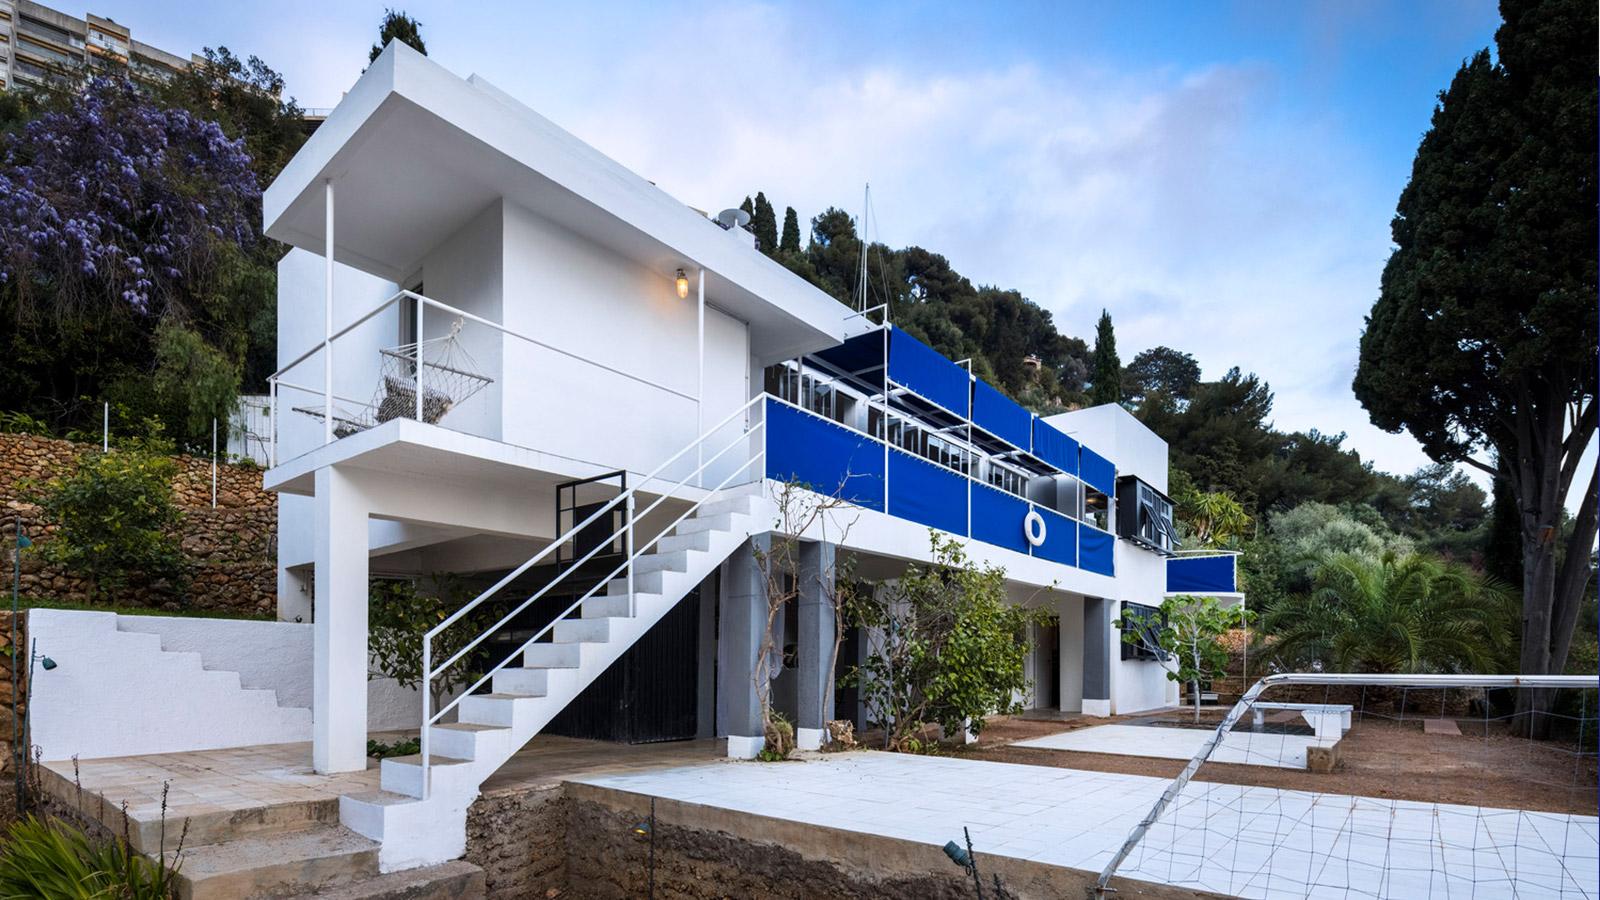 Eileen Grey's E-1027 Villa restored and open to the public